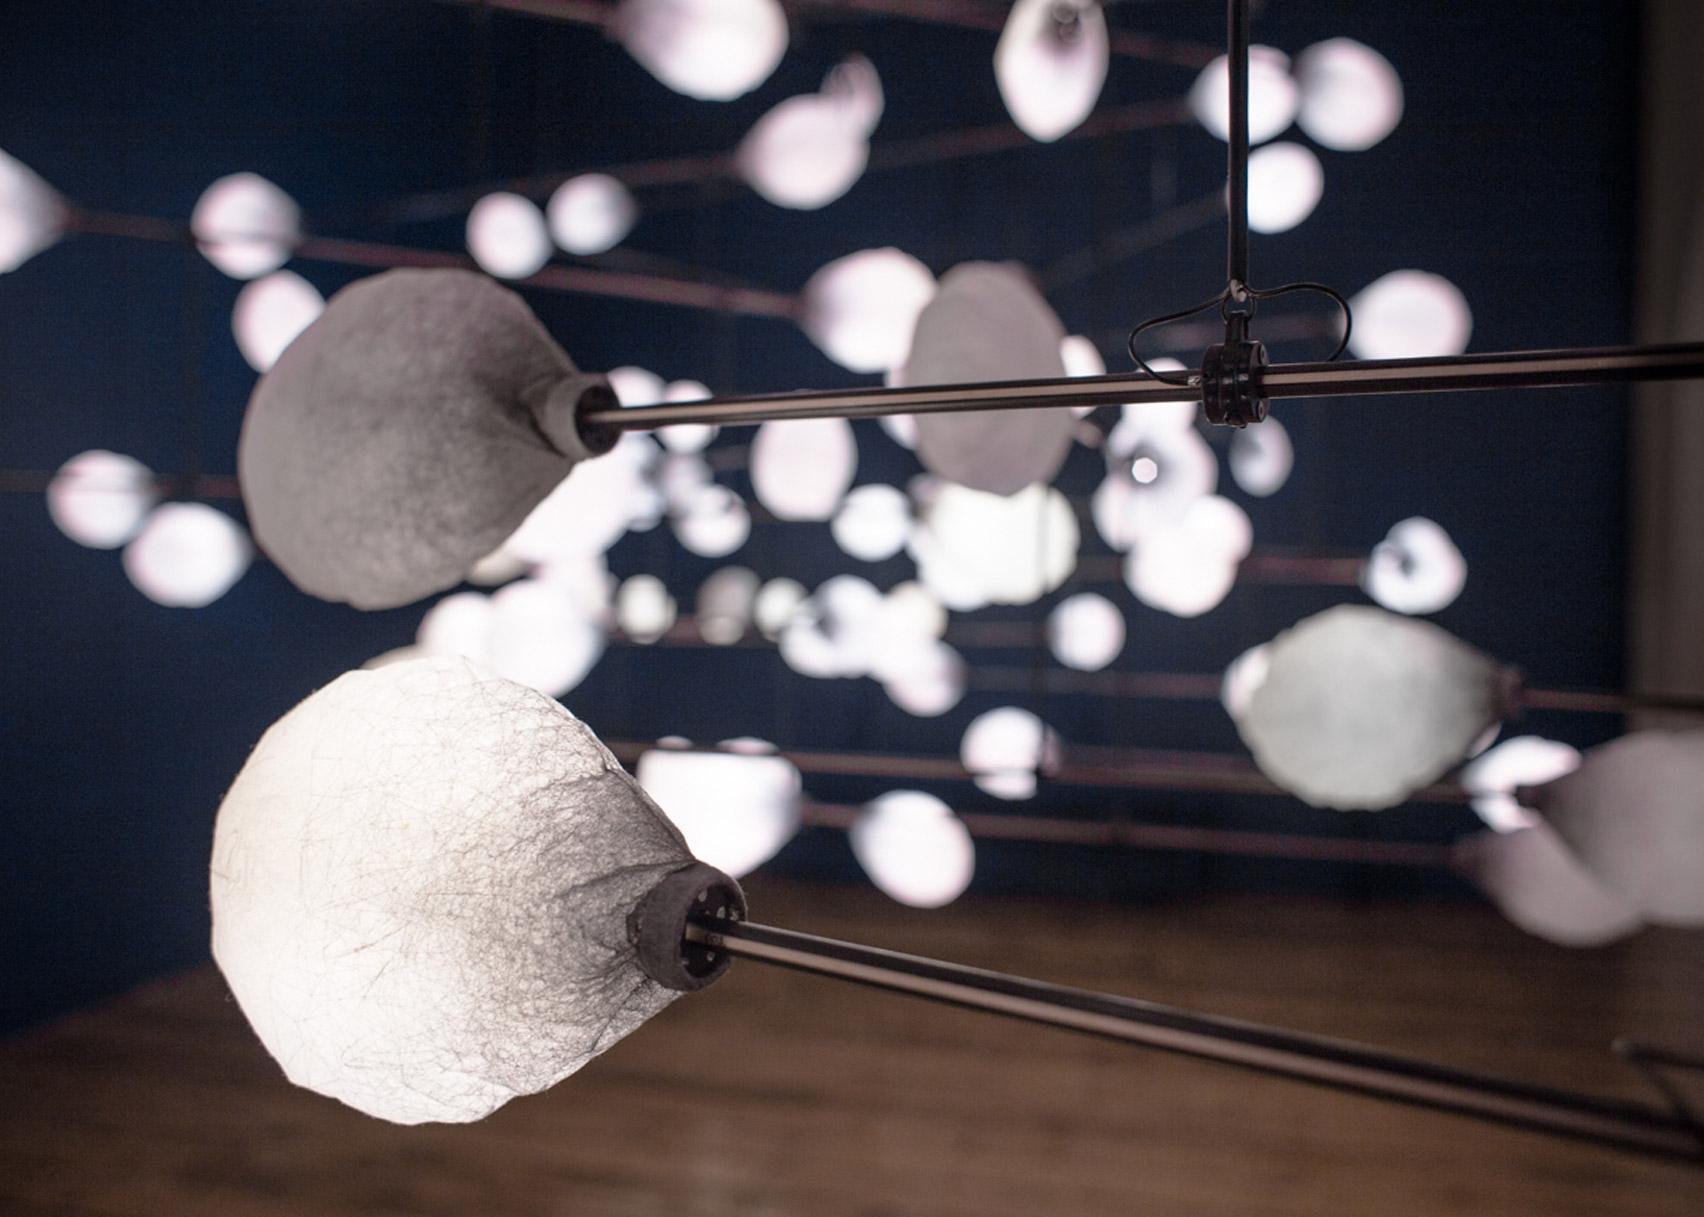 LeveL by mischer'traxler at the London Design Biennale 2016